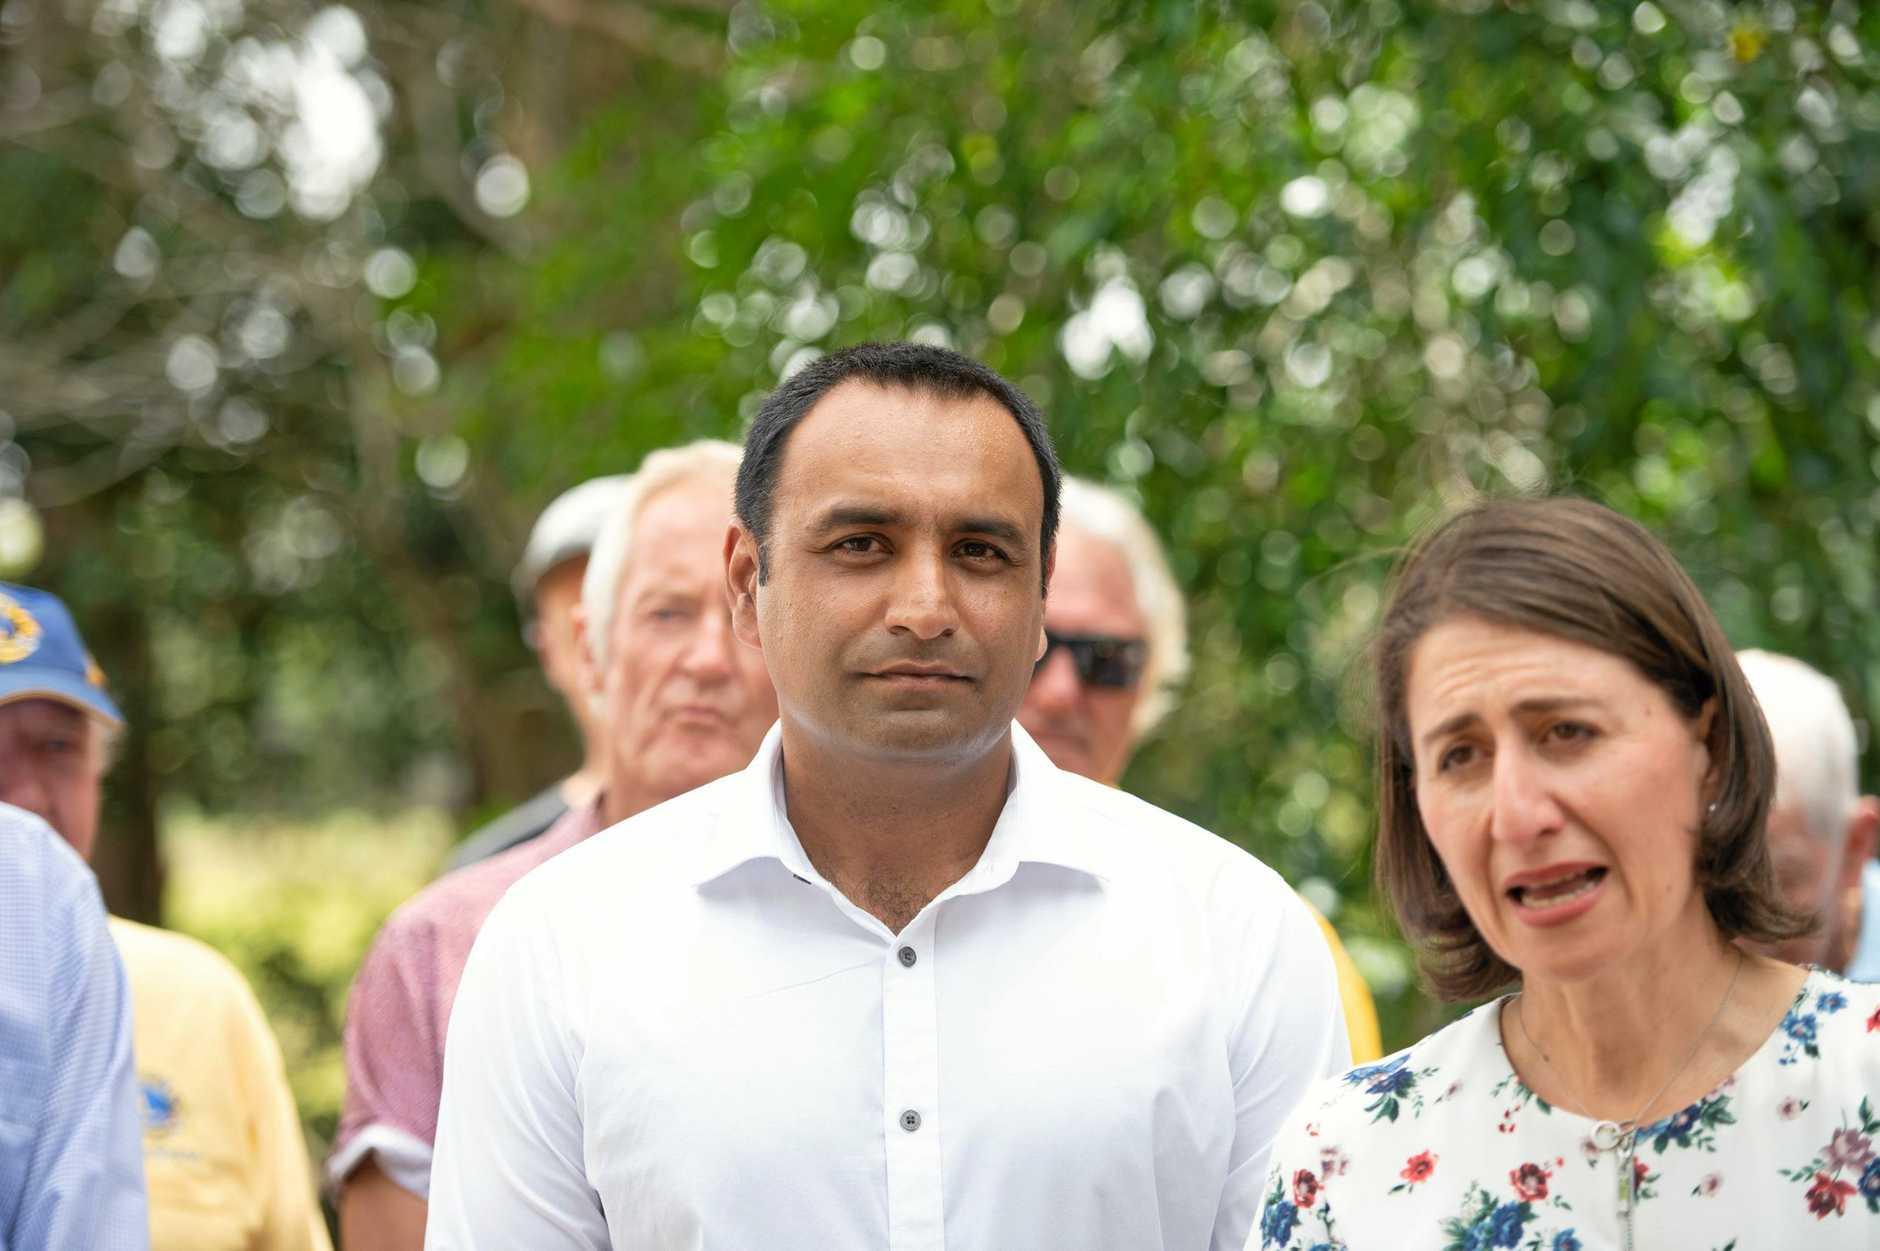 Nationals candidate for Coffs Harbour Gurmesh Singh with Premier Gladys Berejiklian.